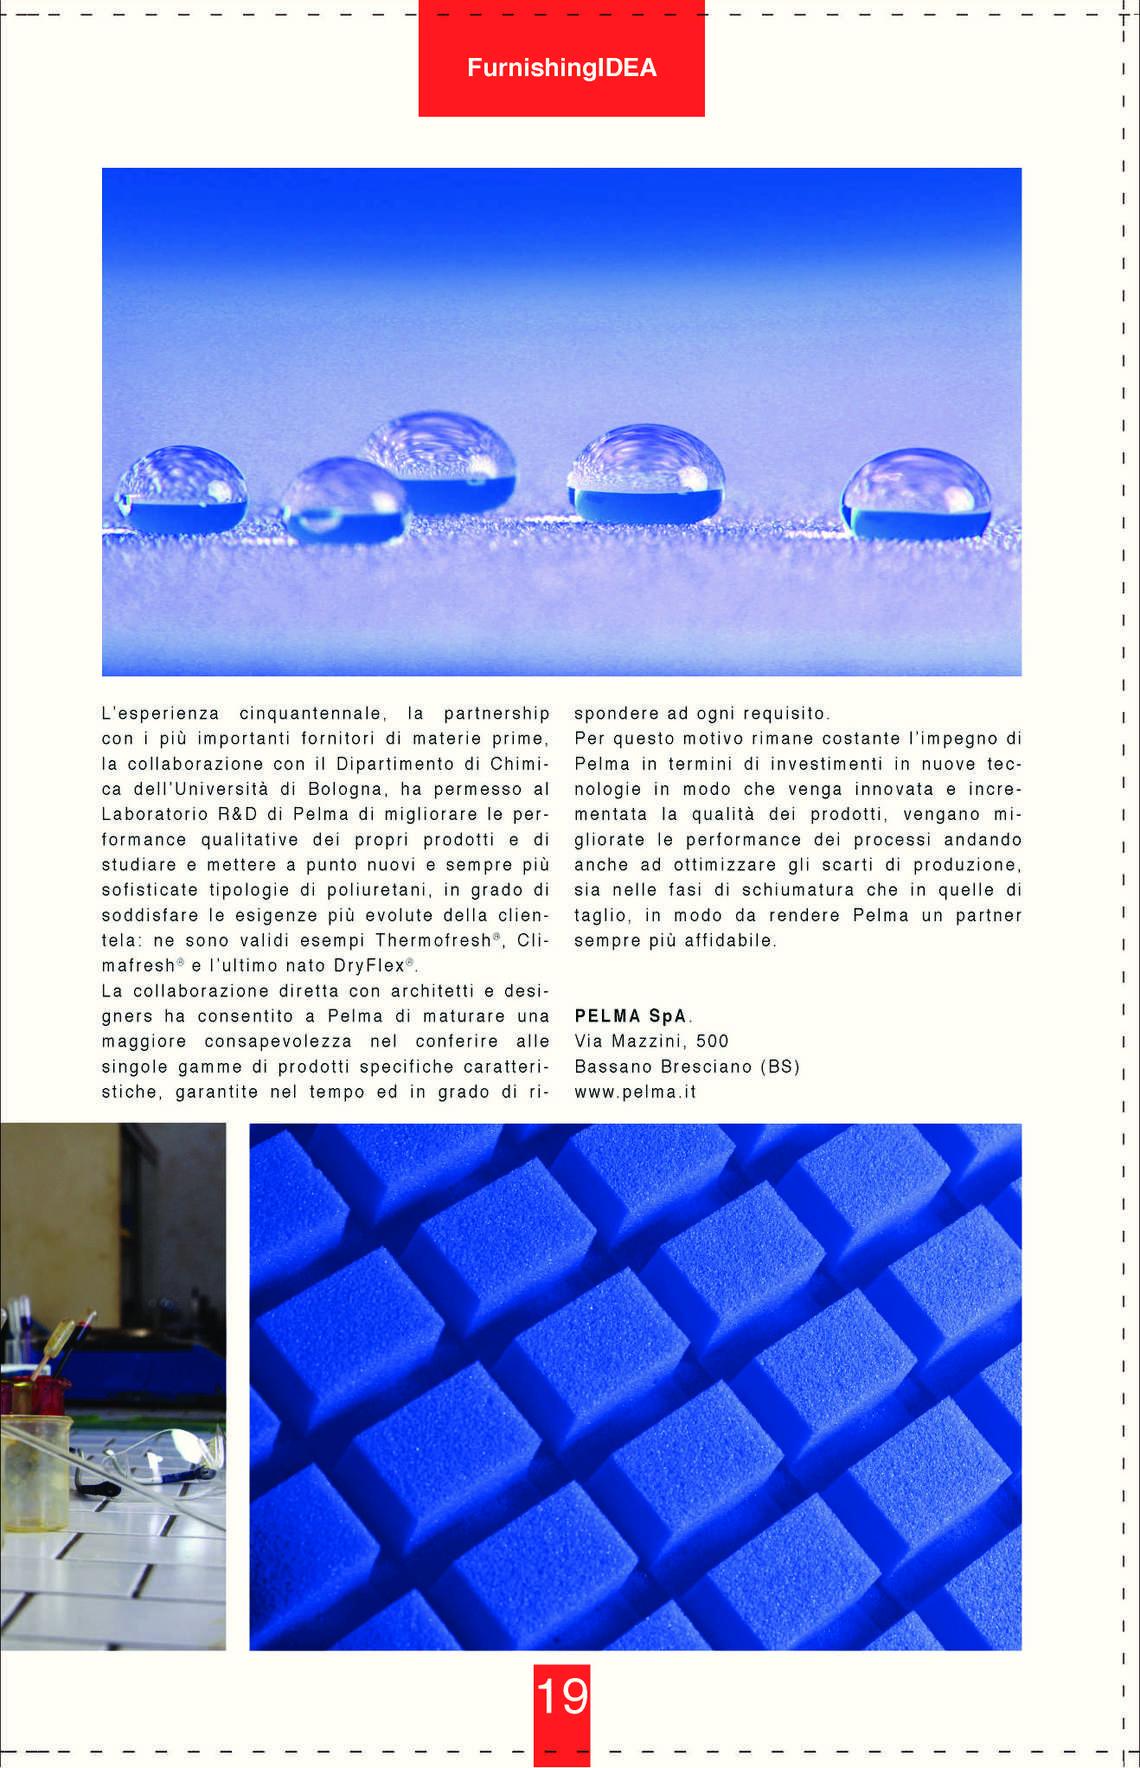 furnishing-idea-journal--1-2018_journal_9_018.jpg